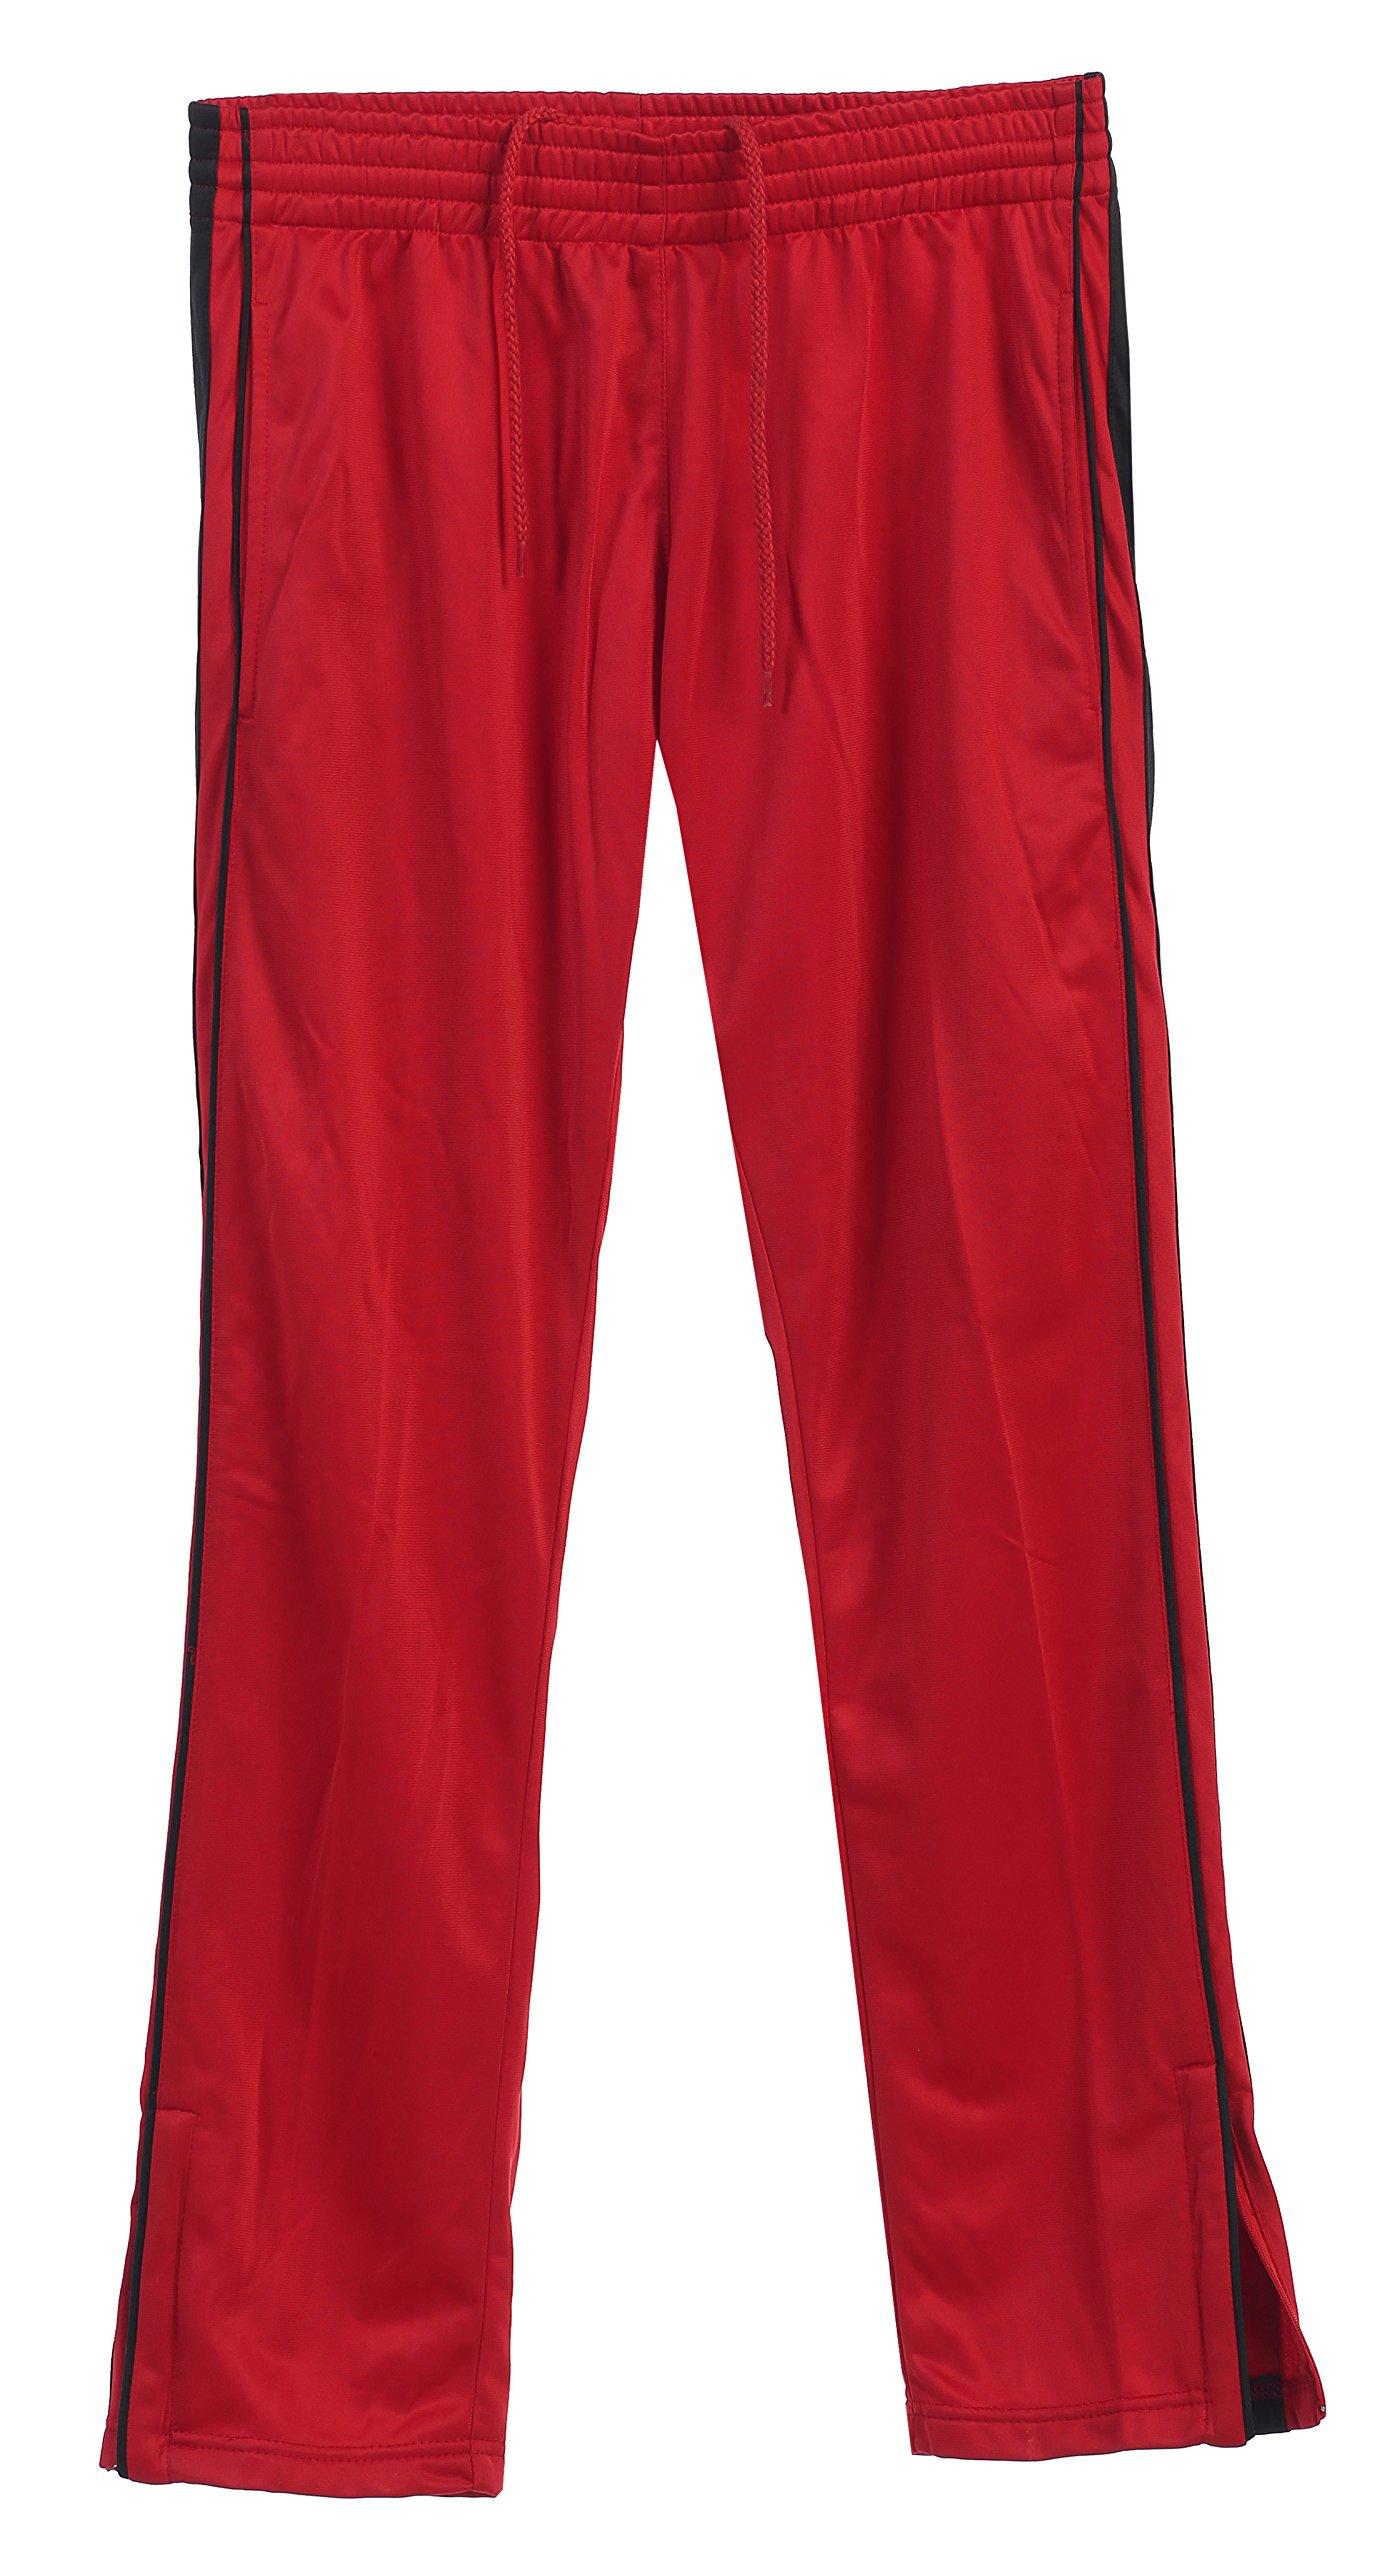 Gioberti Men's Athletic Track Pants, Red, Small